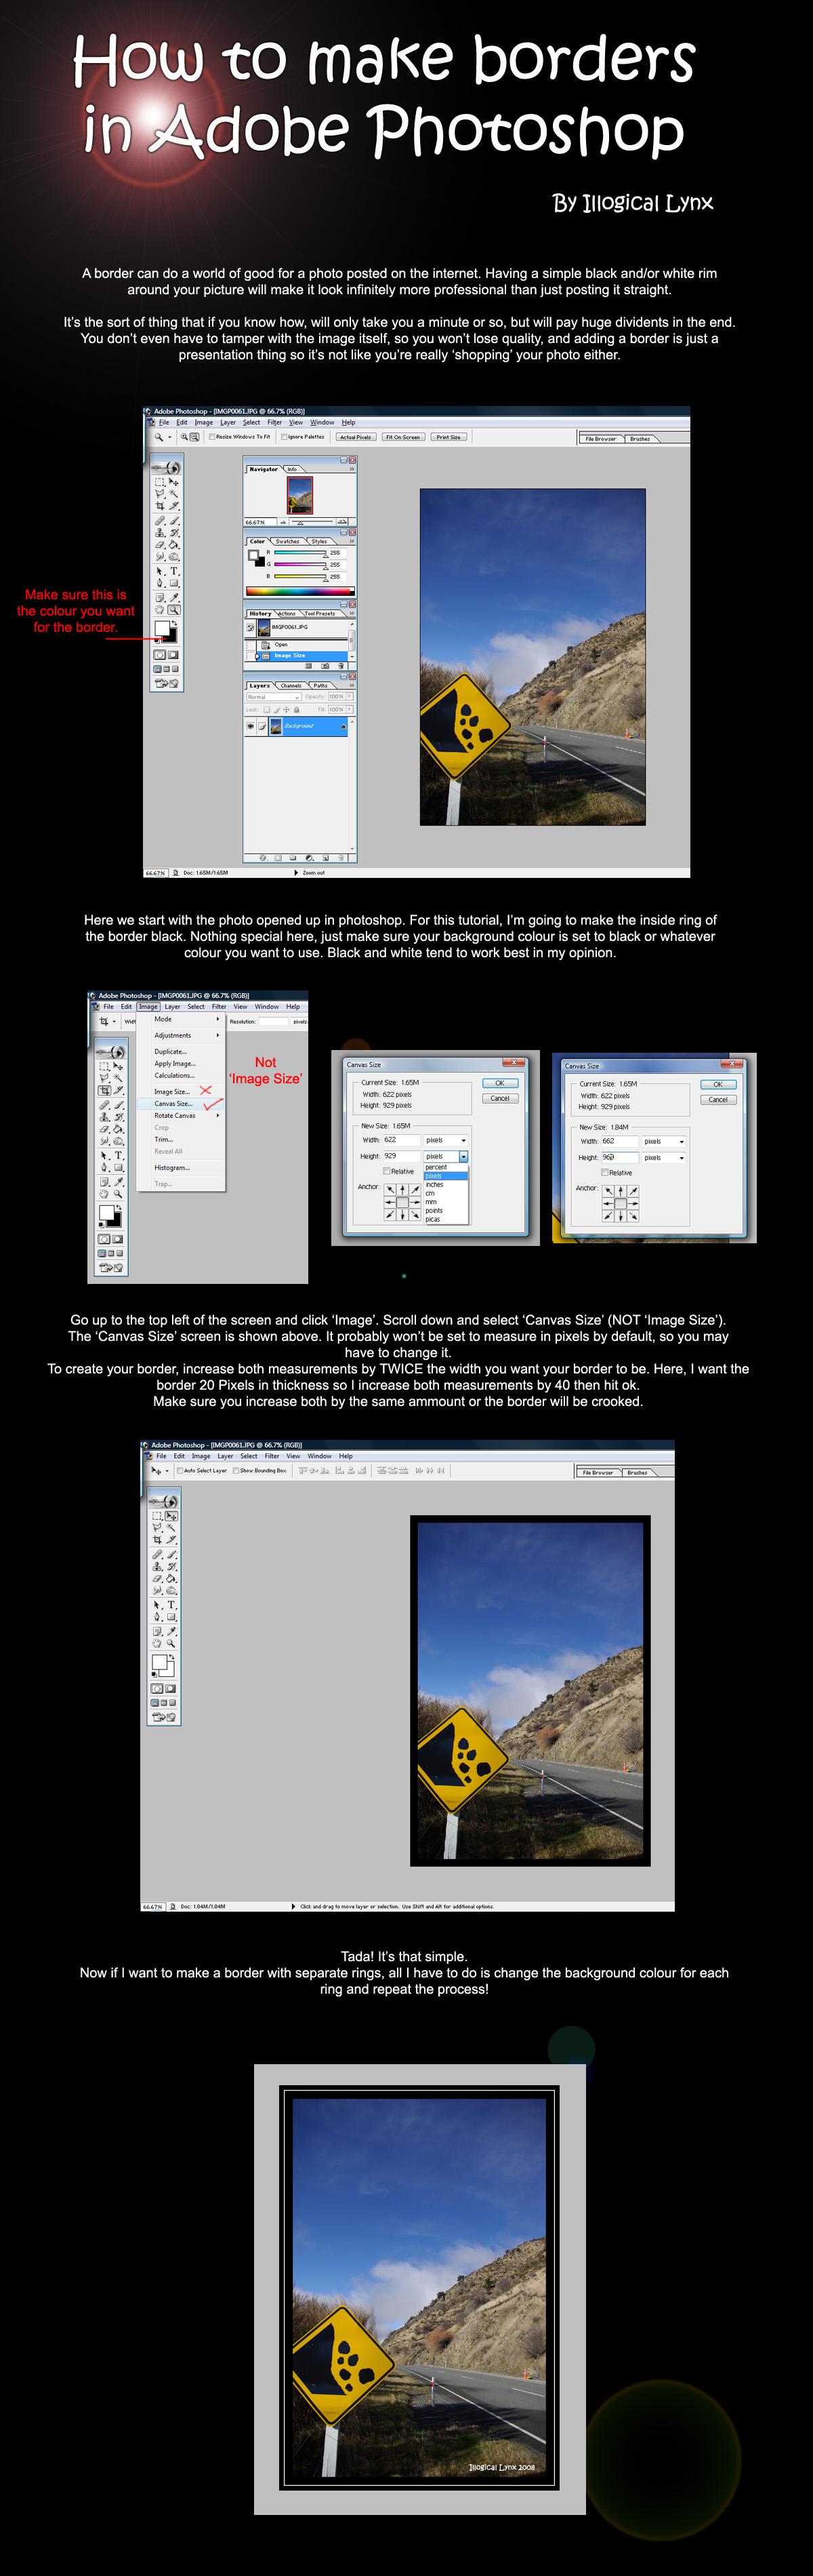 Photoshop border tutorial by illogical lynx on deviantart photoshop border tutorial by illogical lynx baditri Images